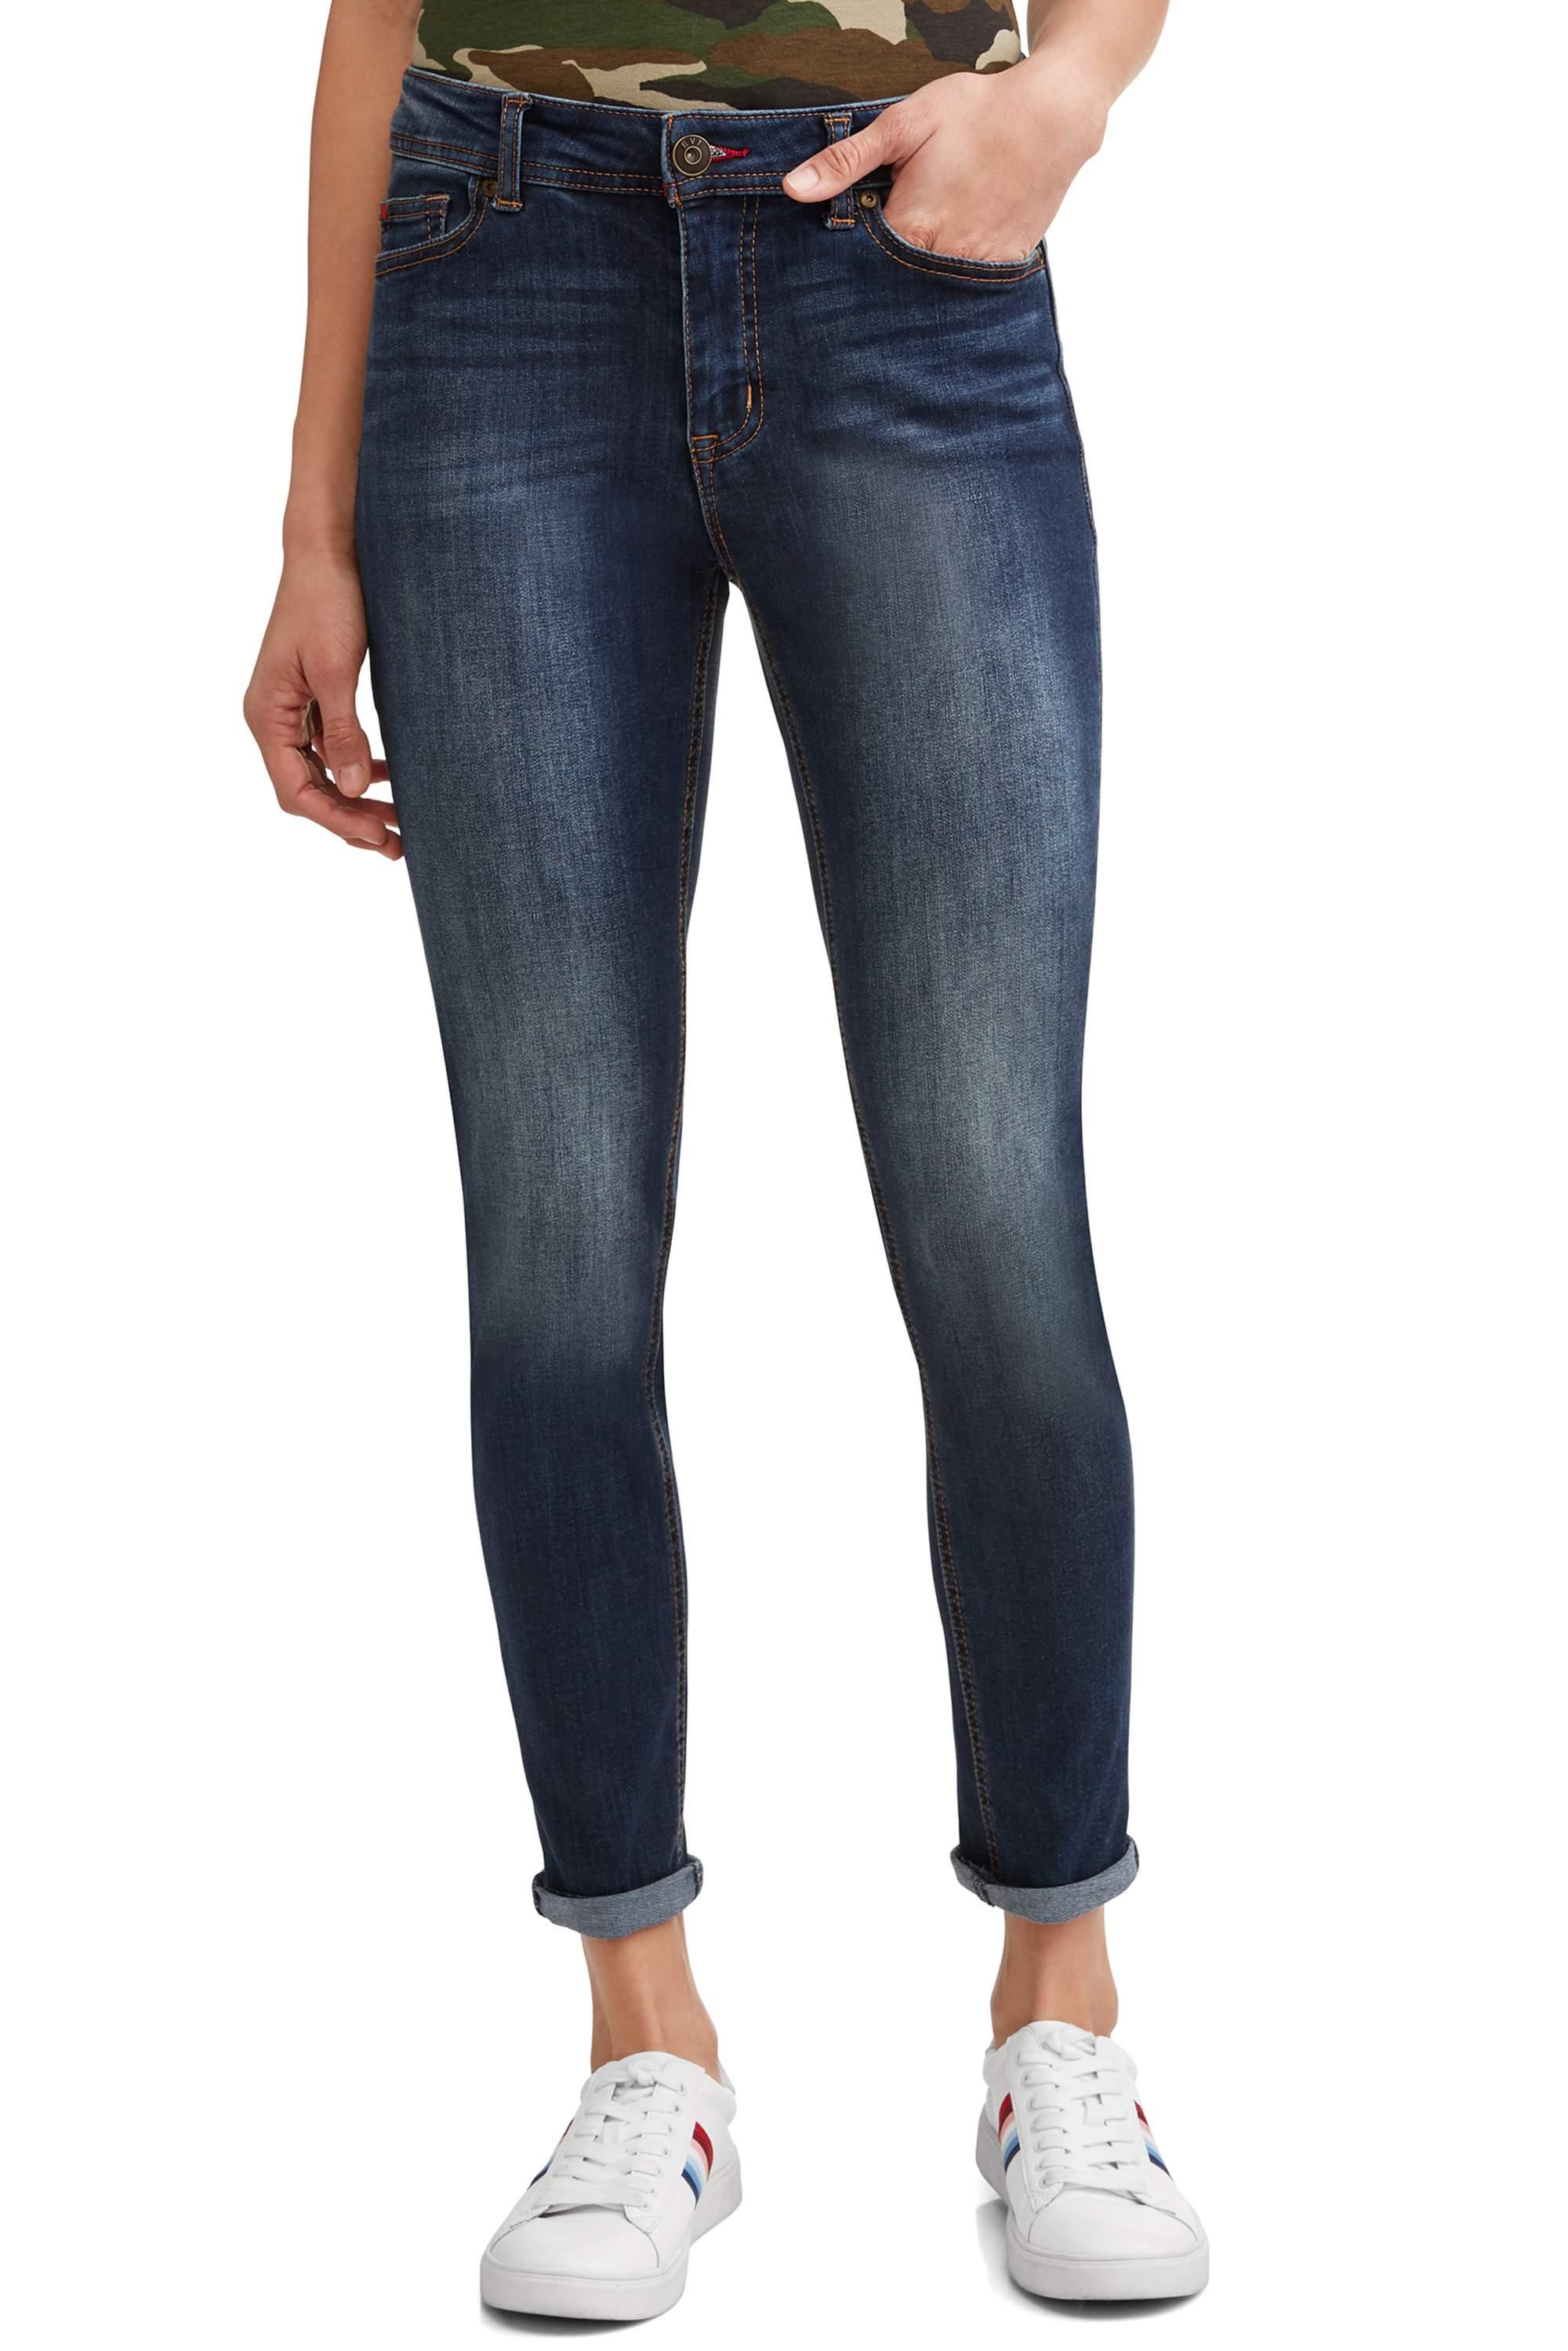 Preston High Rise Skinny Ankle Jean Women's (Medium Wash)